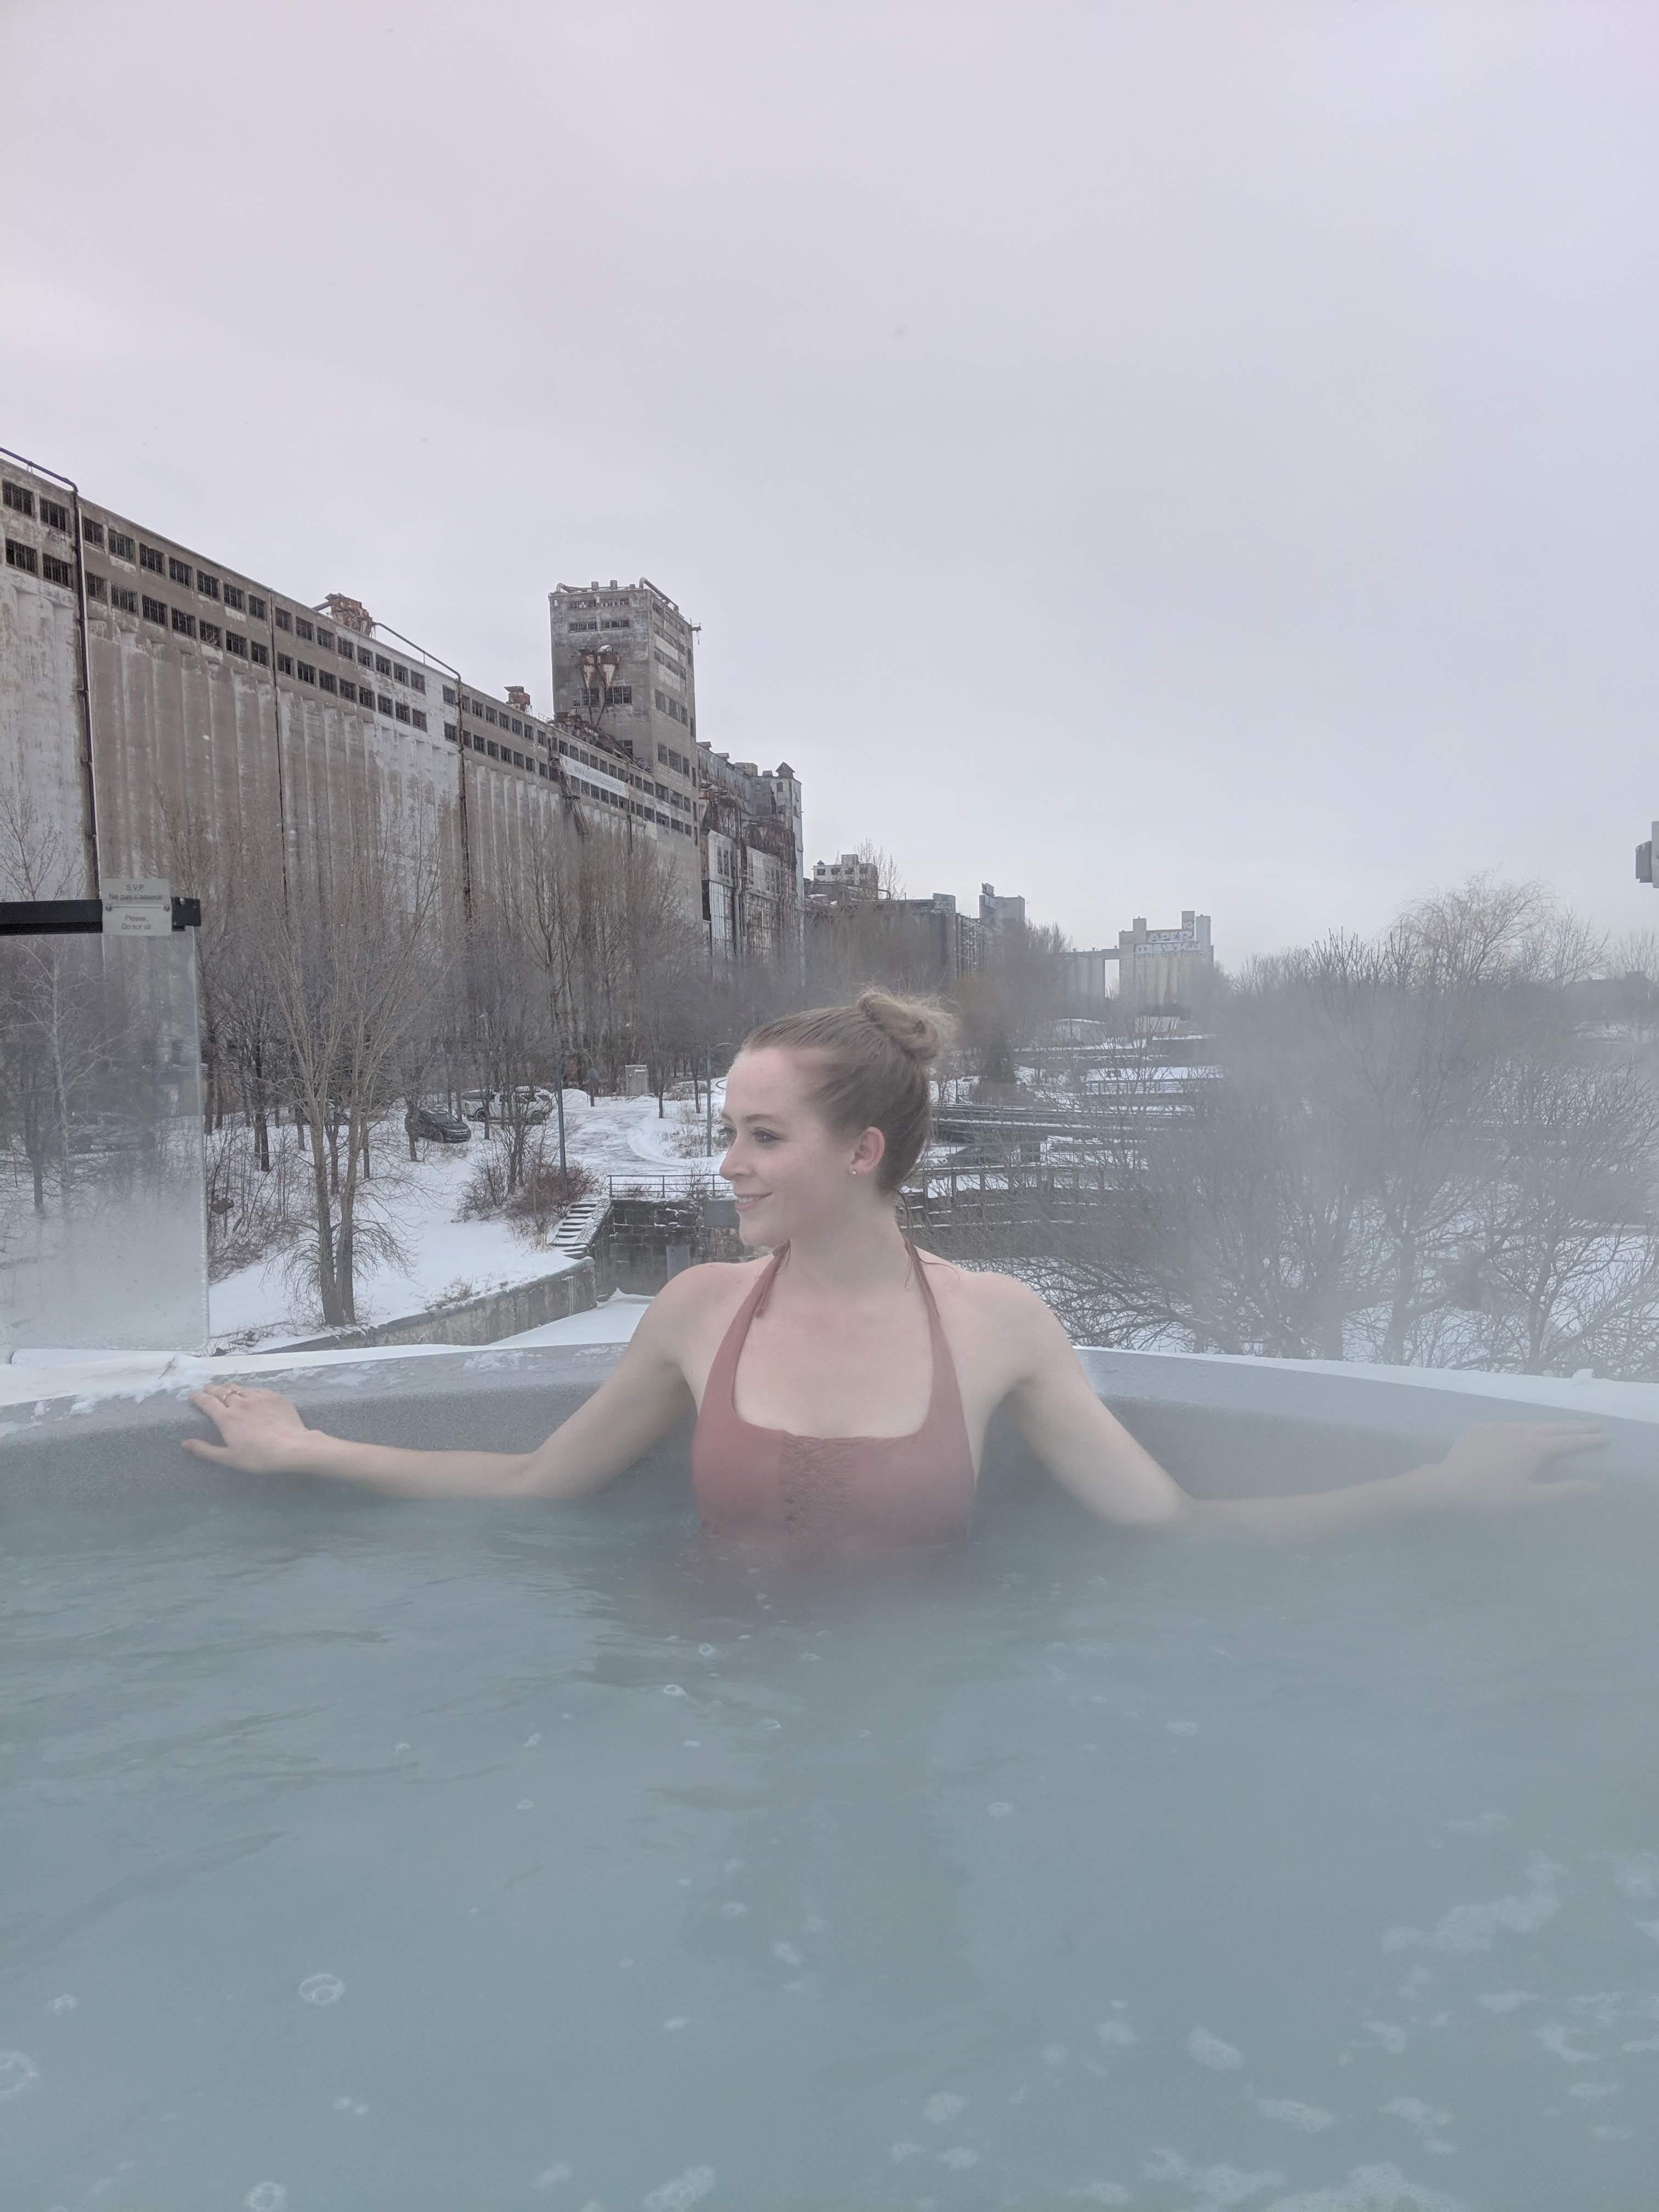 Montreal Bota Bota spa review